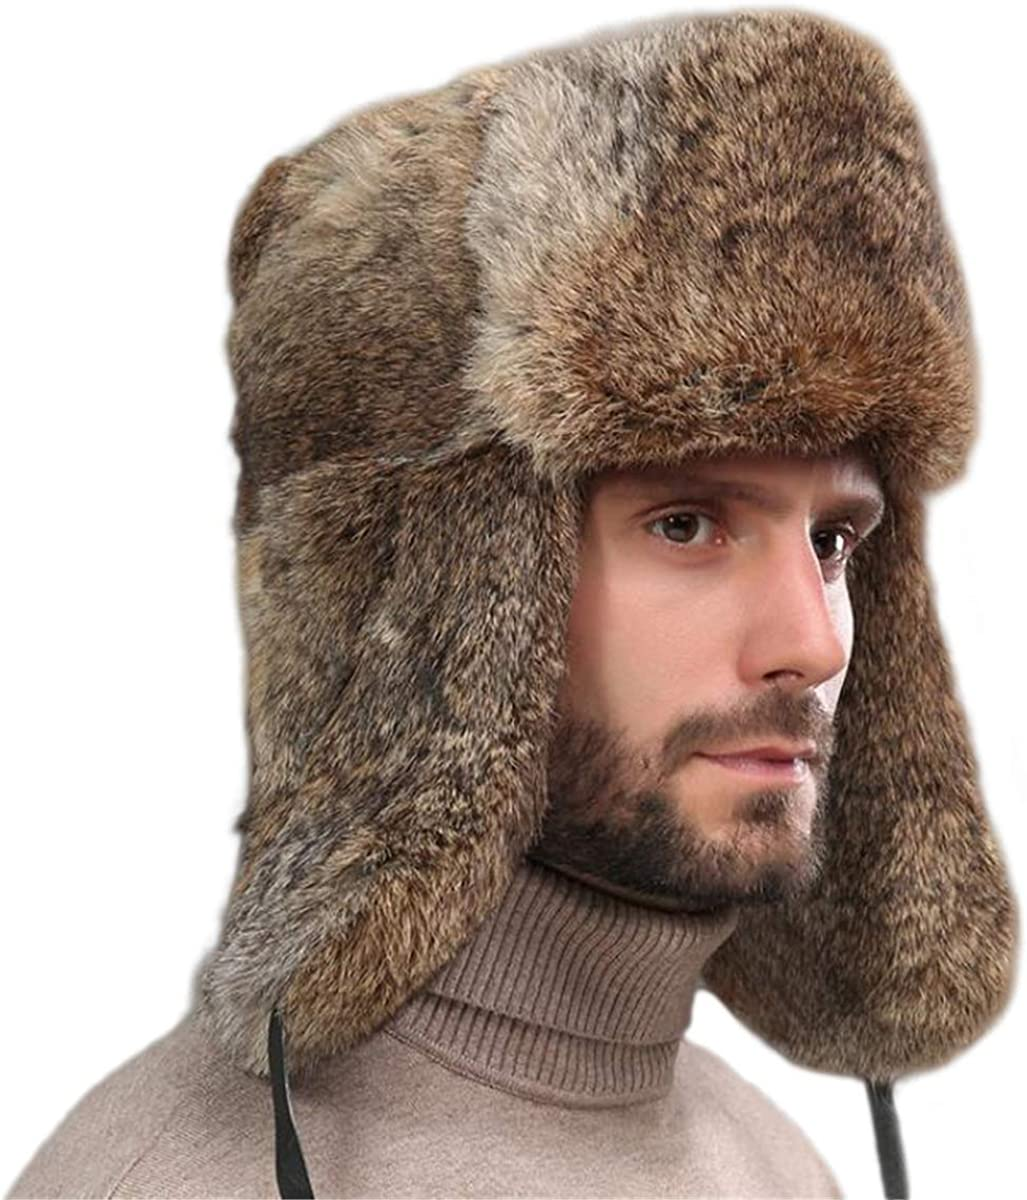 KAISHIN Unisex Winter Full-pelt Rabbit Fur Bomber Hats Russian Ushanka Hats for Men Women Cotton Layer Skiing Hats